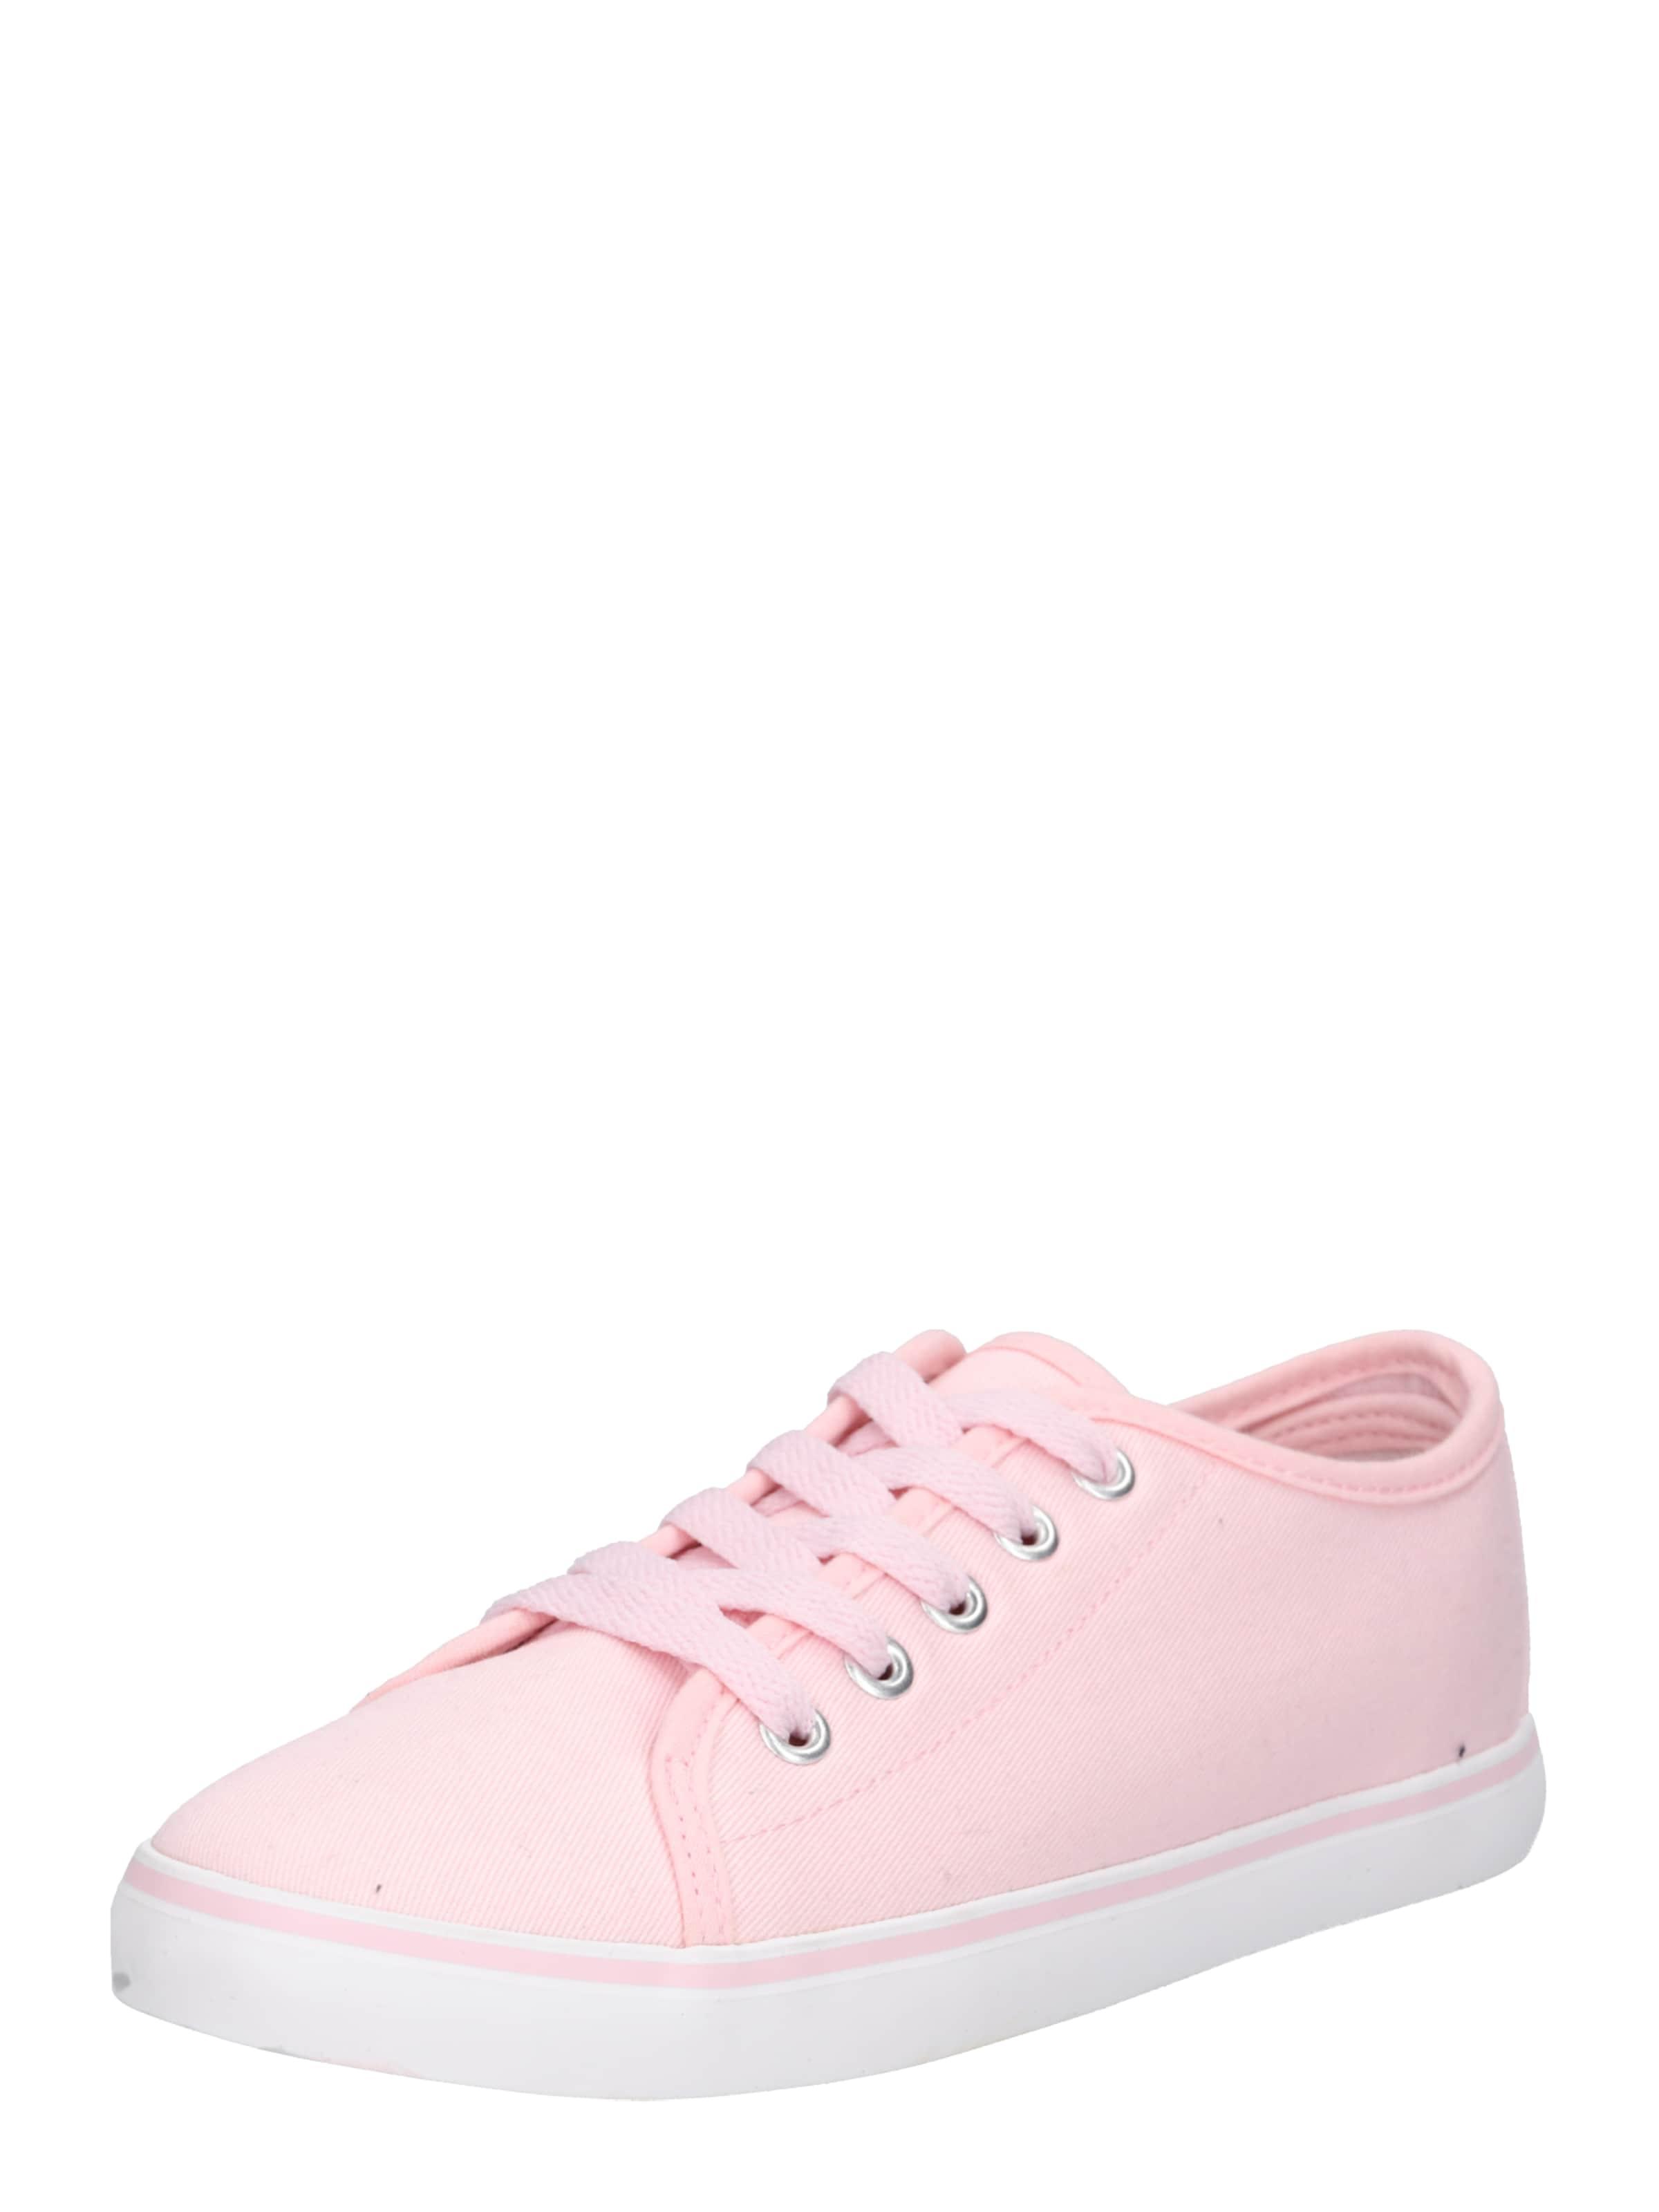 Sneaker In Shoe' About 'henriette Rosa You SpGzqUMV